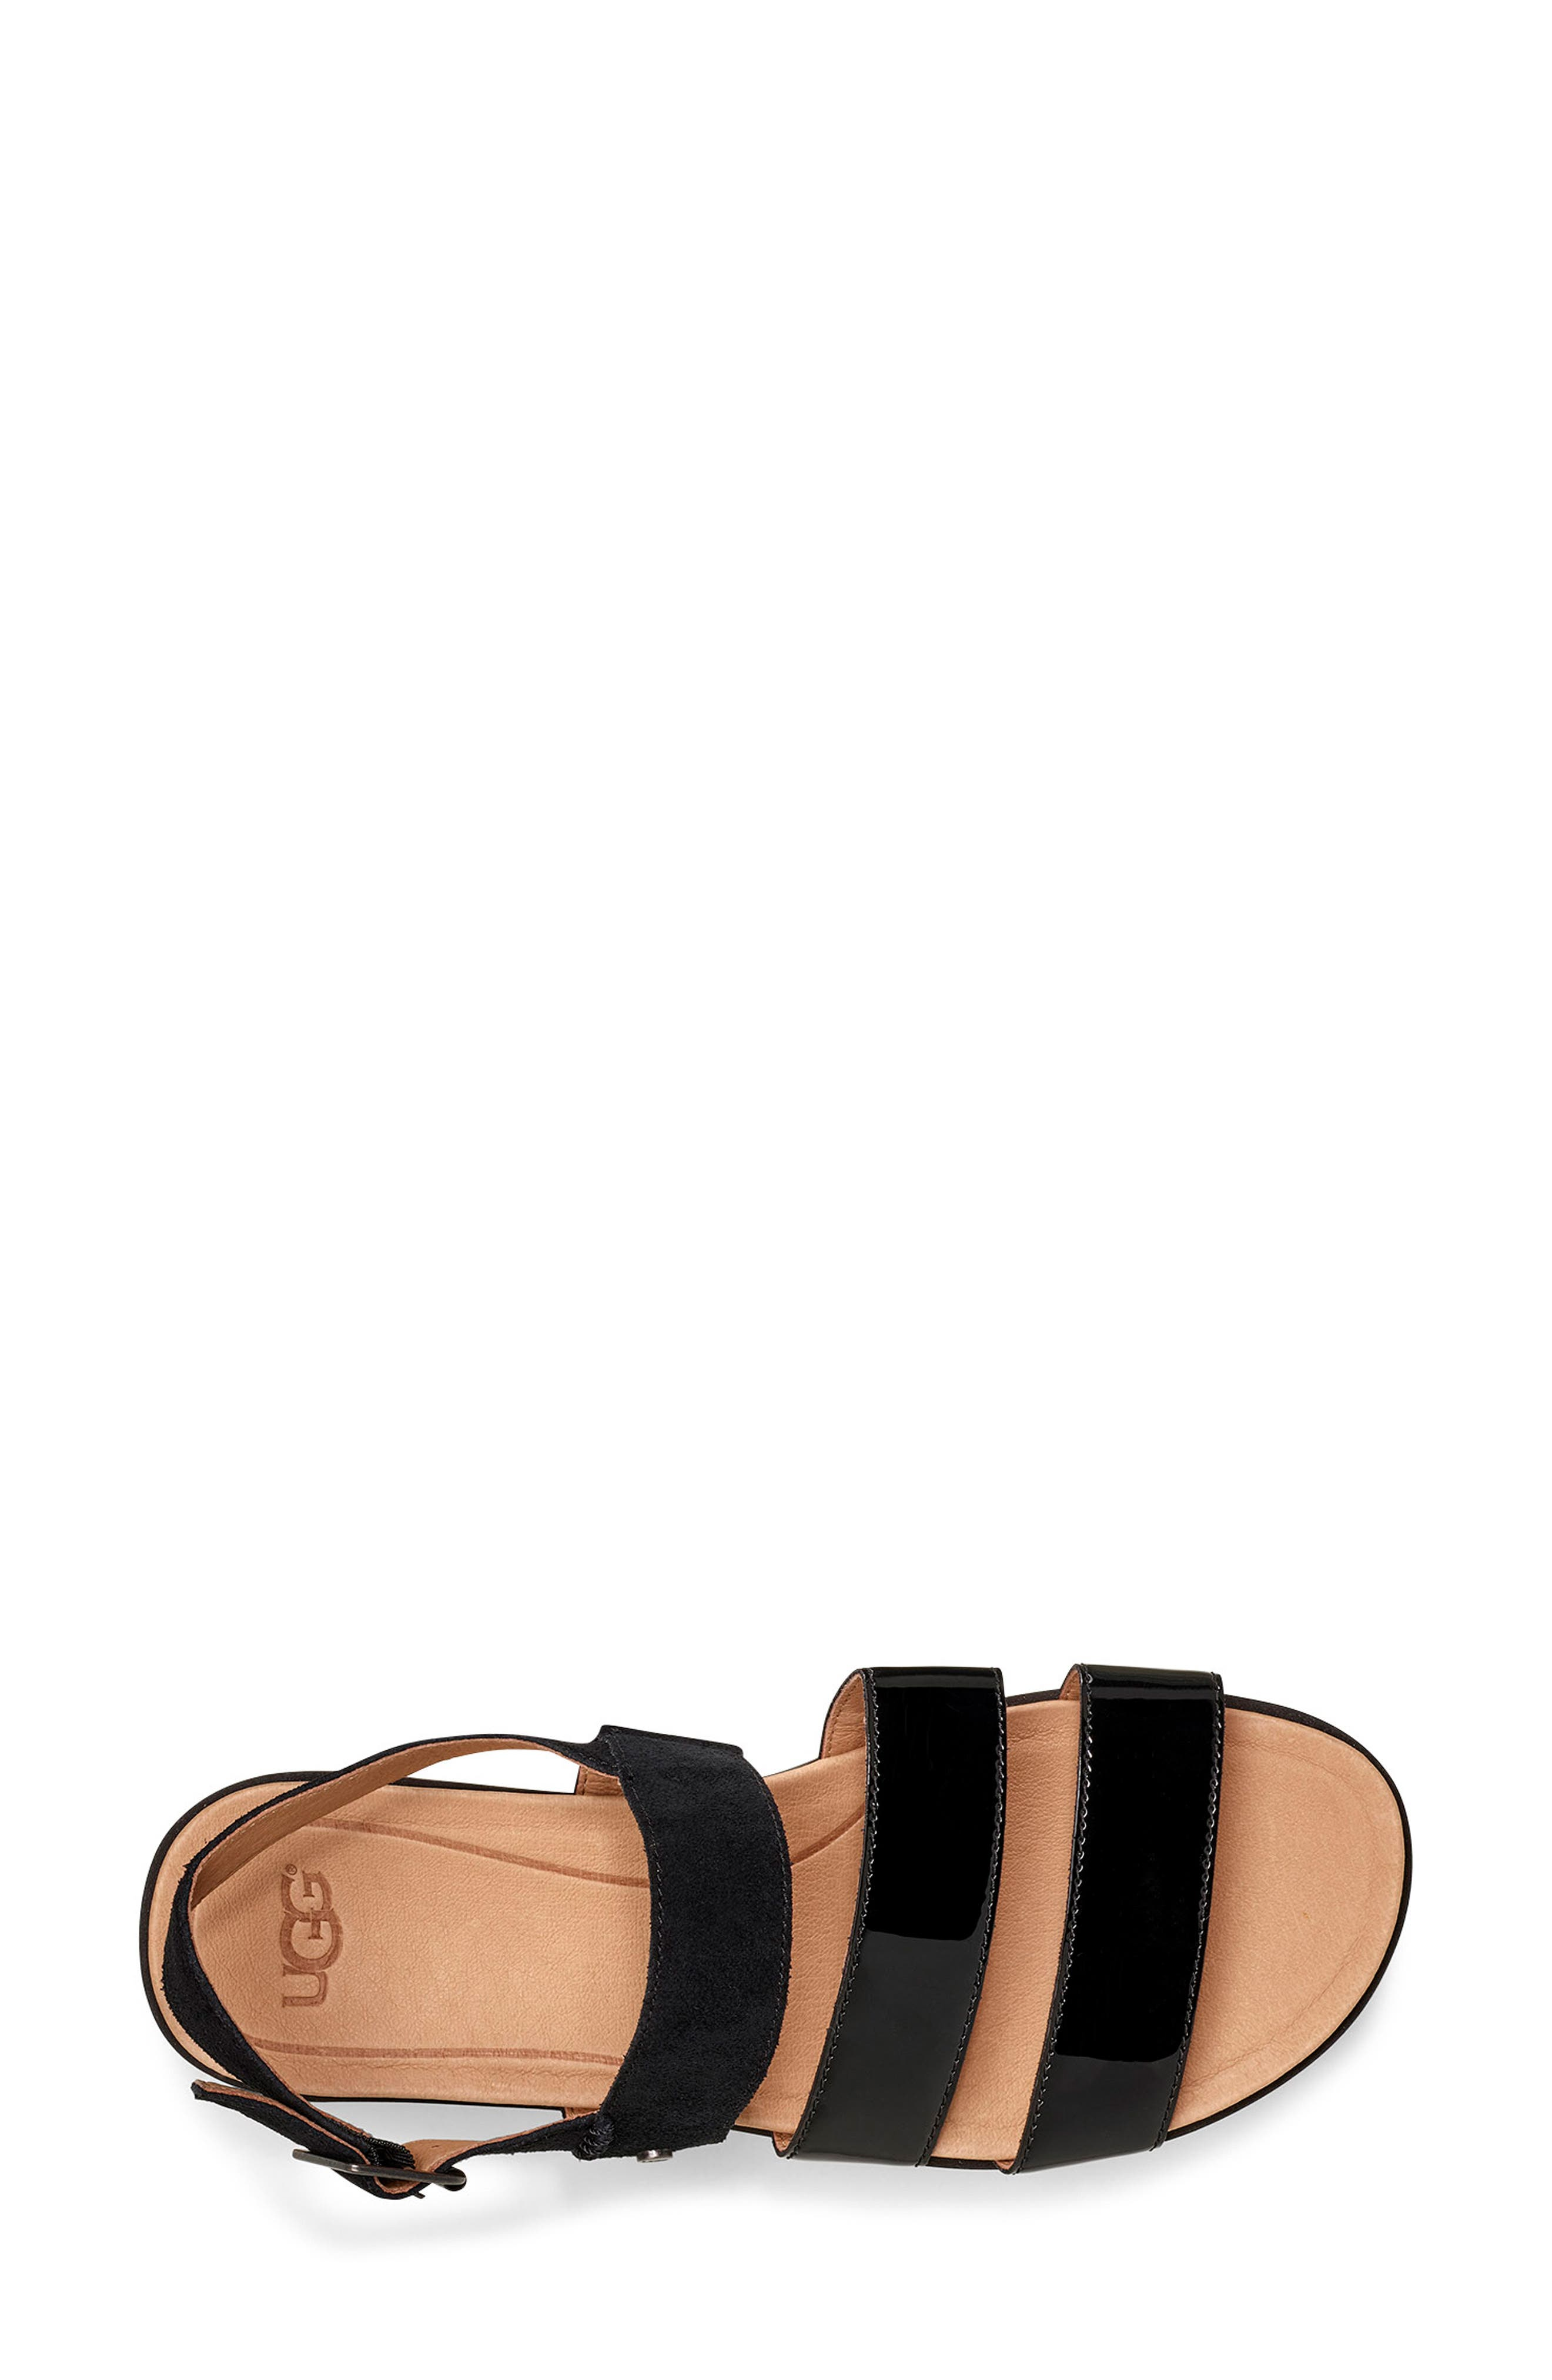 Braelynn Flatform Sandal,                             Alternate thumbnail 4, color,                             BLACK LEATHER